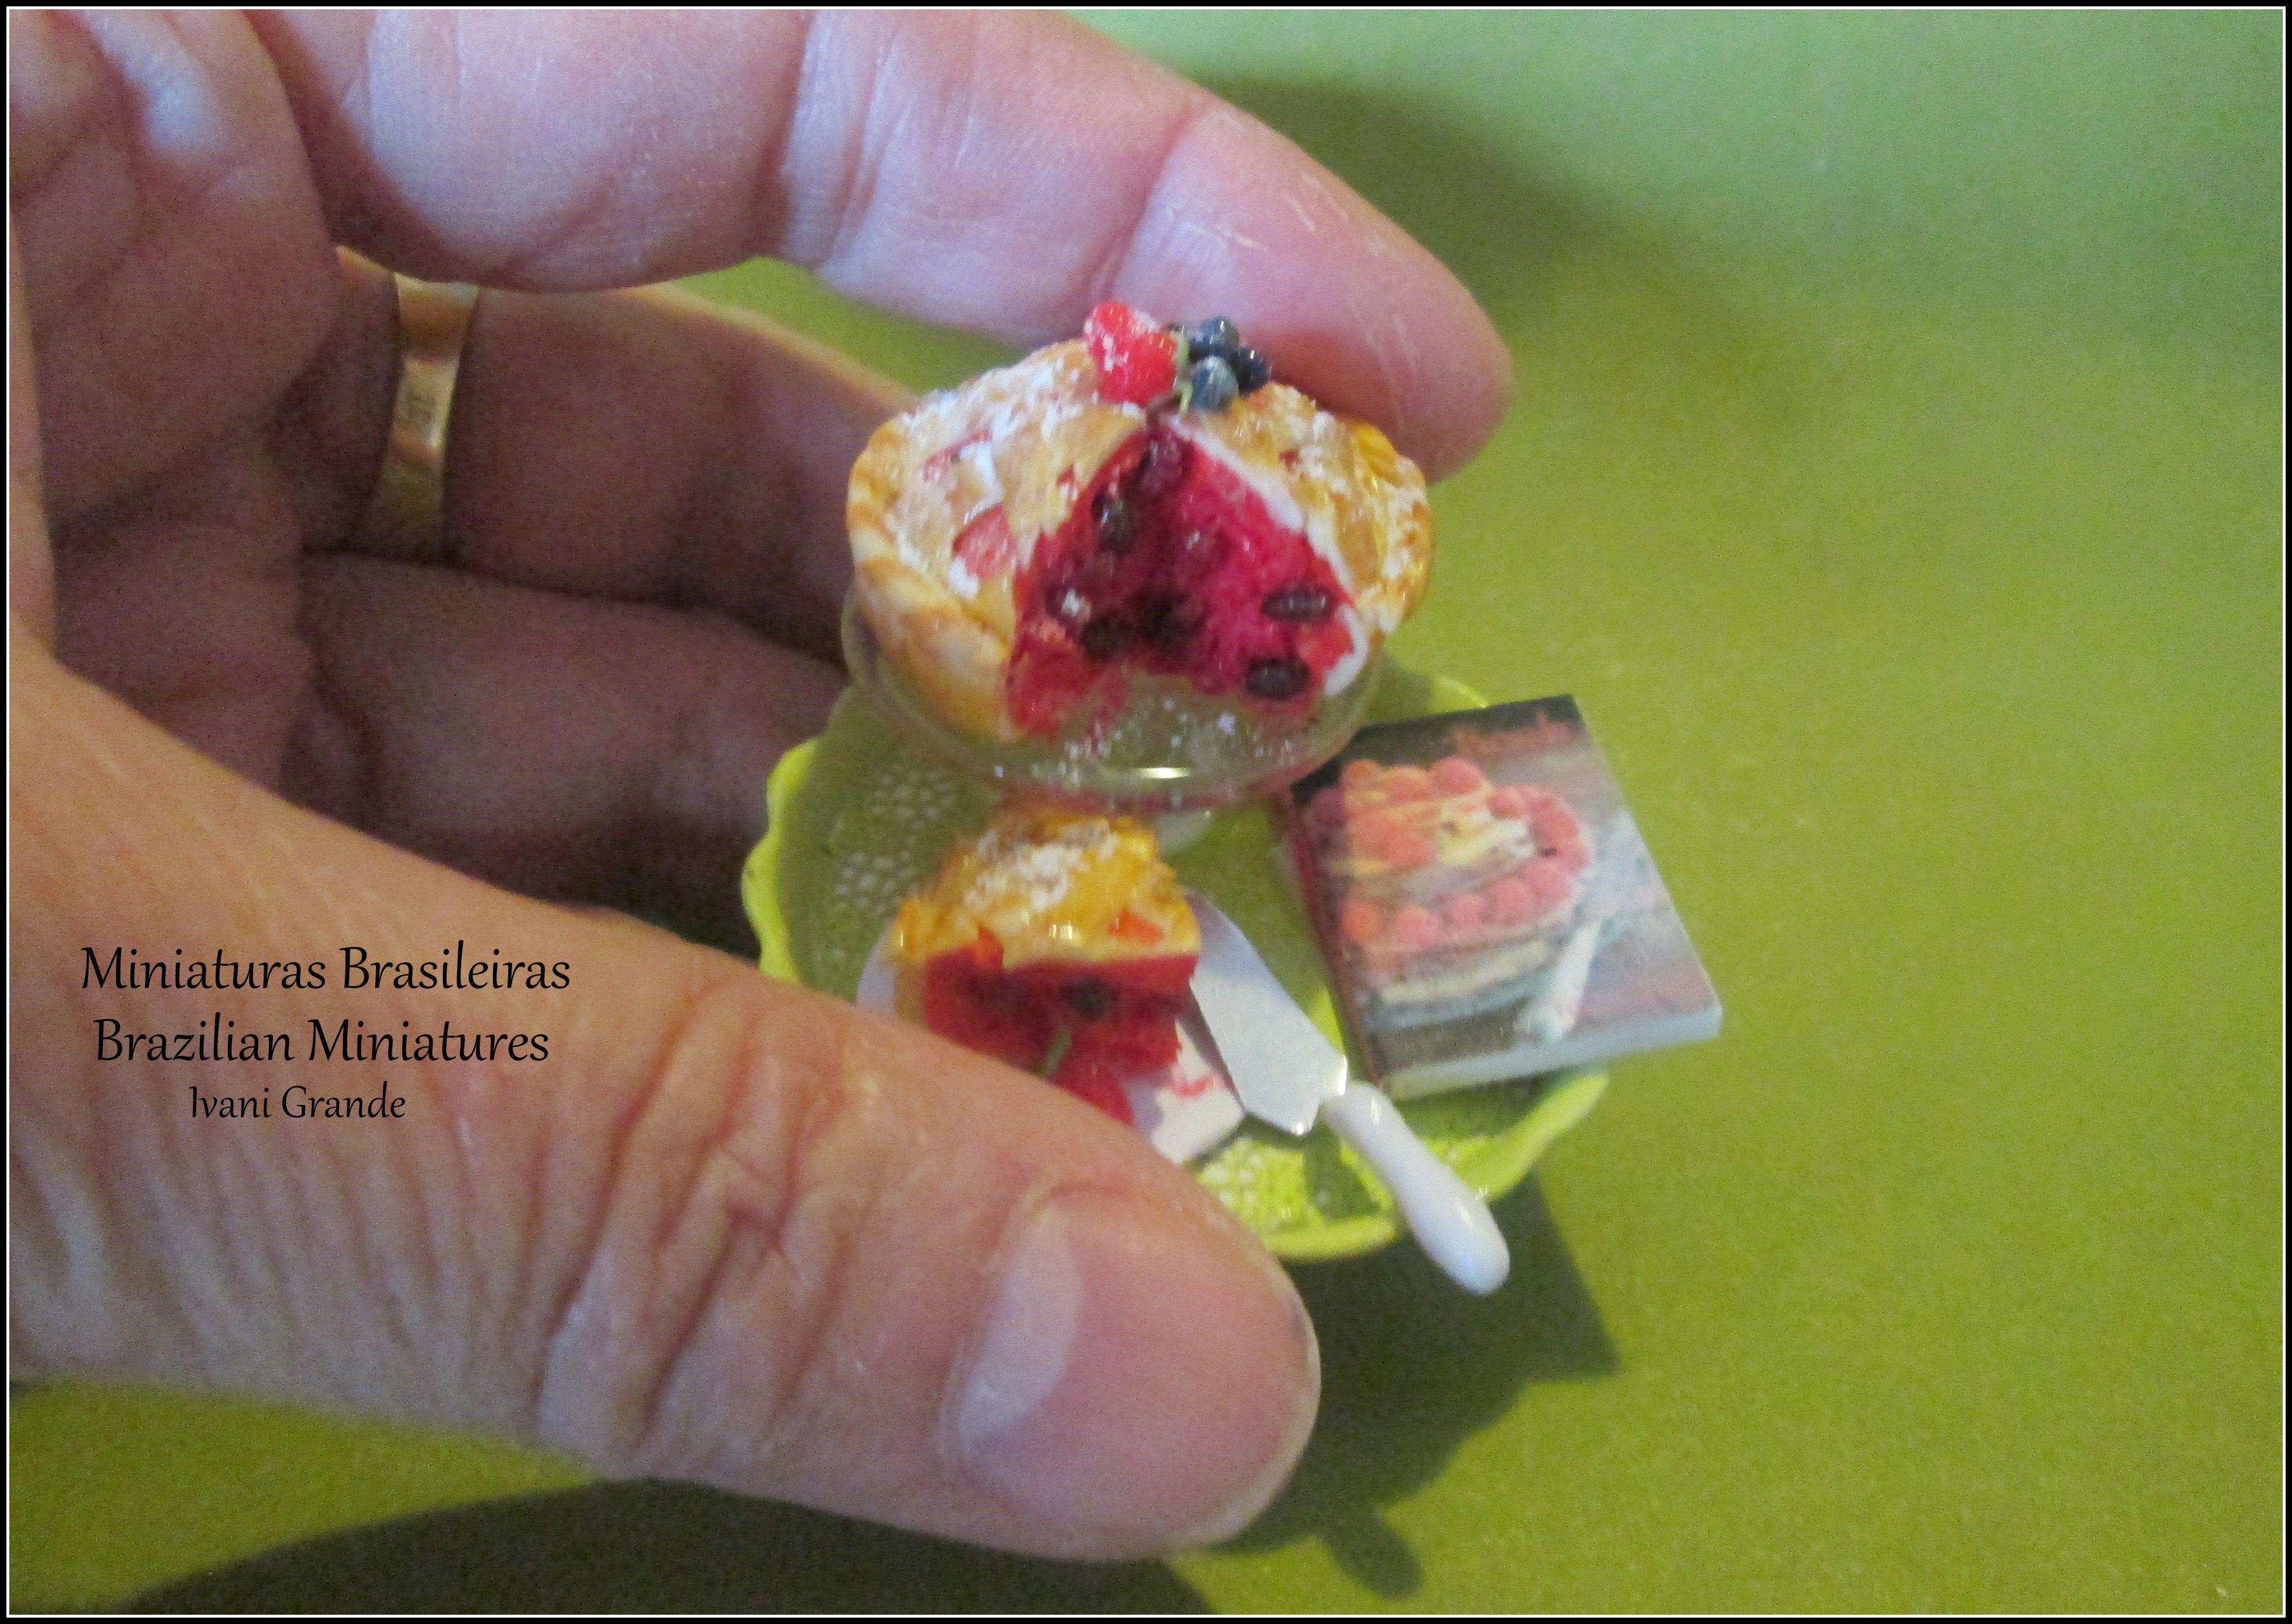 Cake, Pie miniatures Food miniatures  https://www.etsy.com/pt/shop/MiniaturaBrasileira